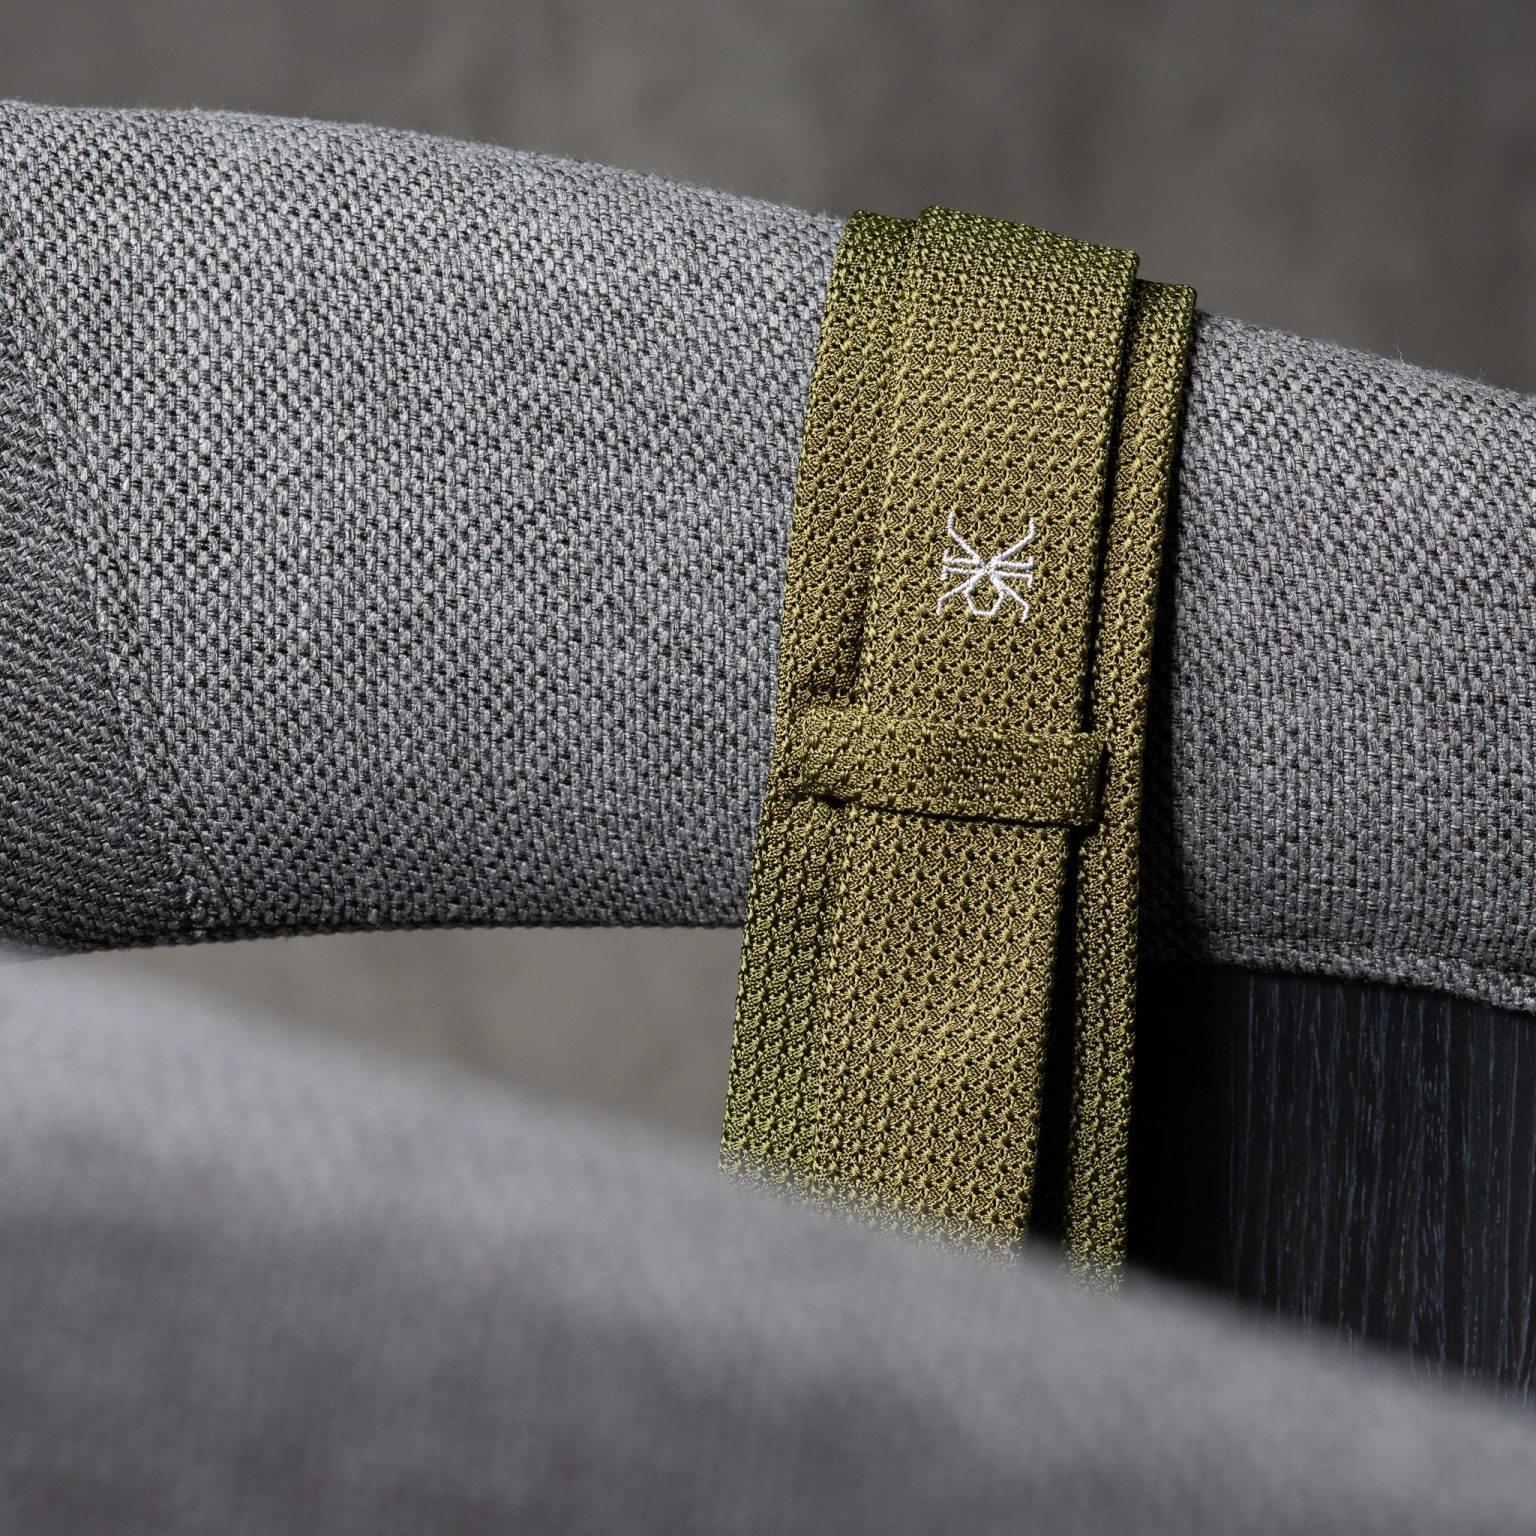 GRENADINE-0145-Tie-Initials-Corbata-Iniciales-The-Seelk-4